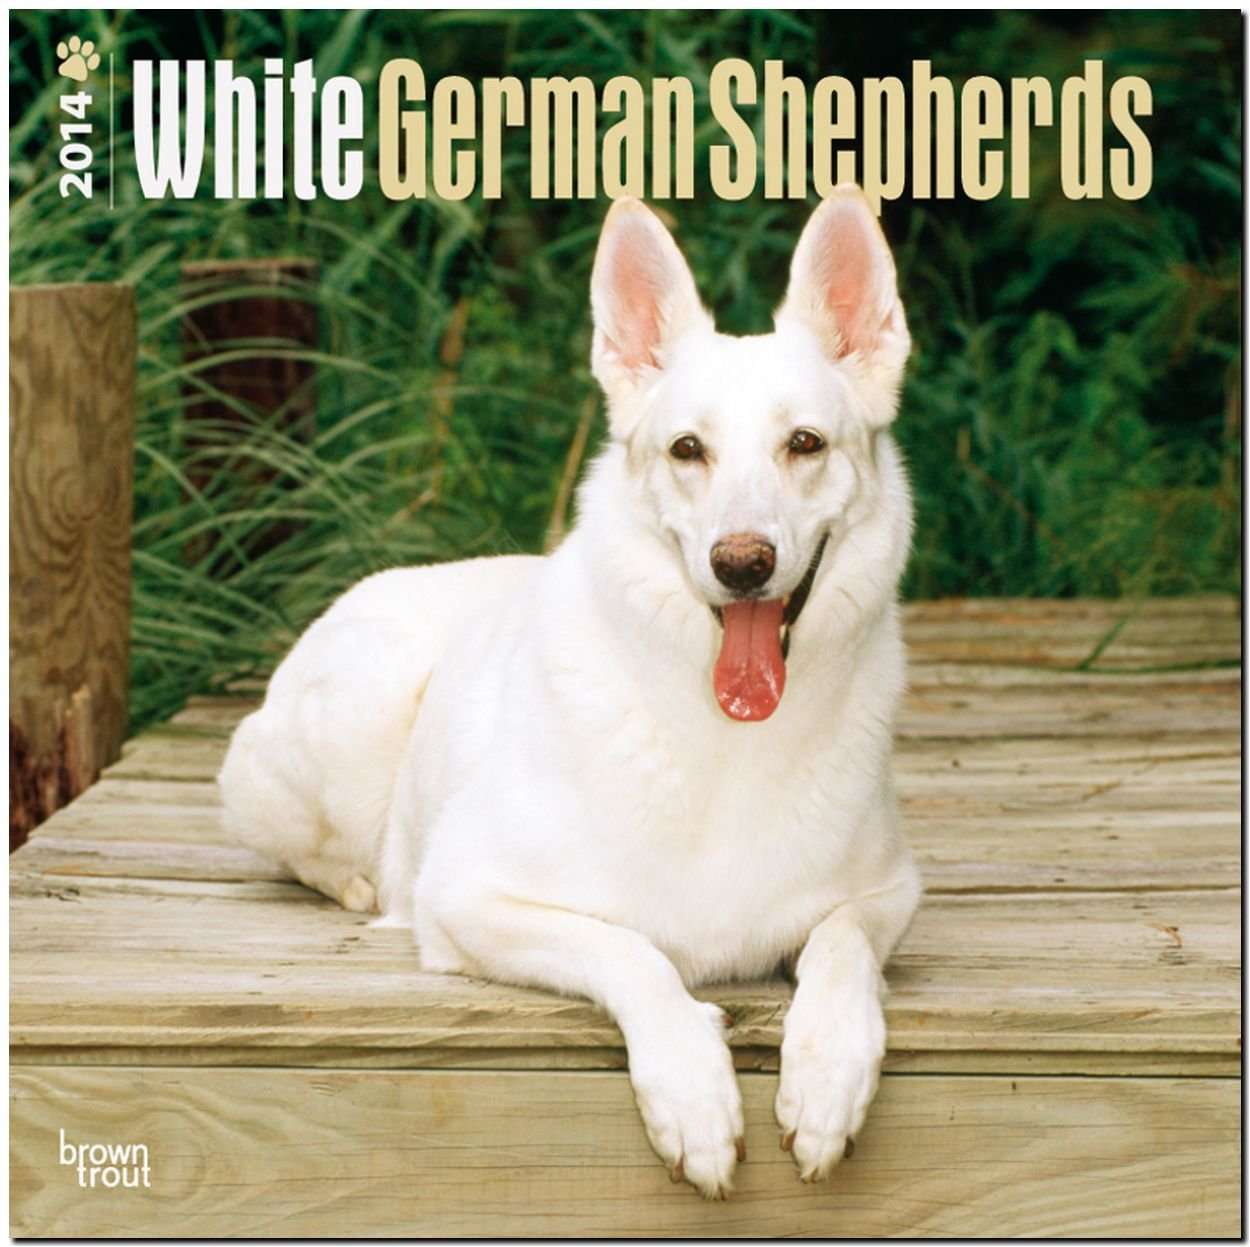 white-german-shepherds-2014-weisse-schferhunde-original-browntrout-kalender-mehrsprachig-kalender